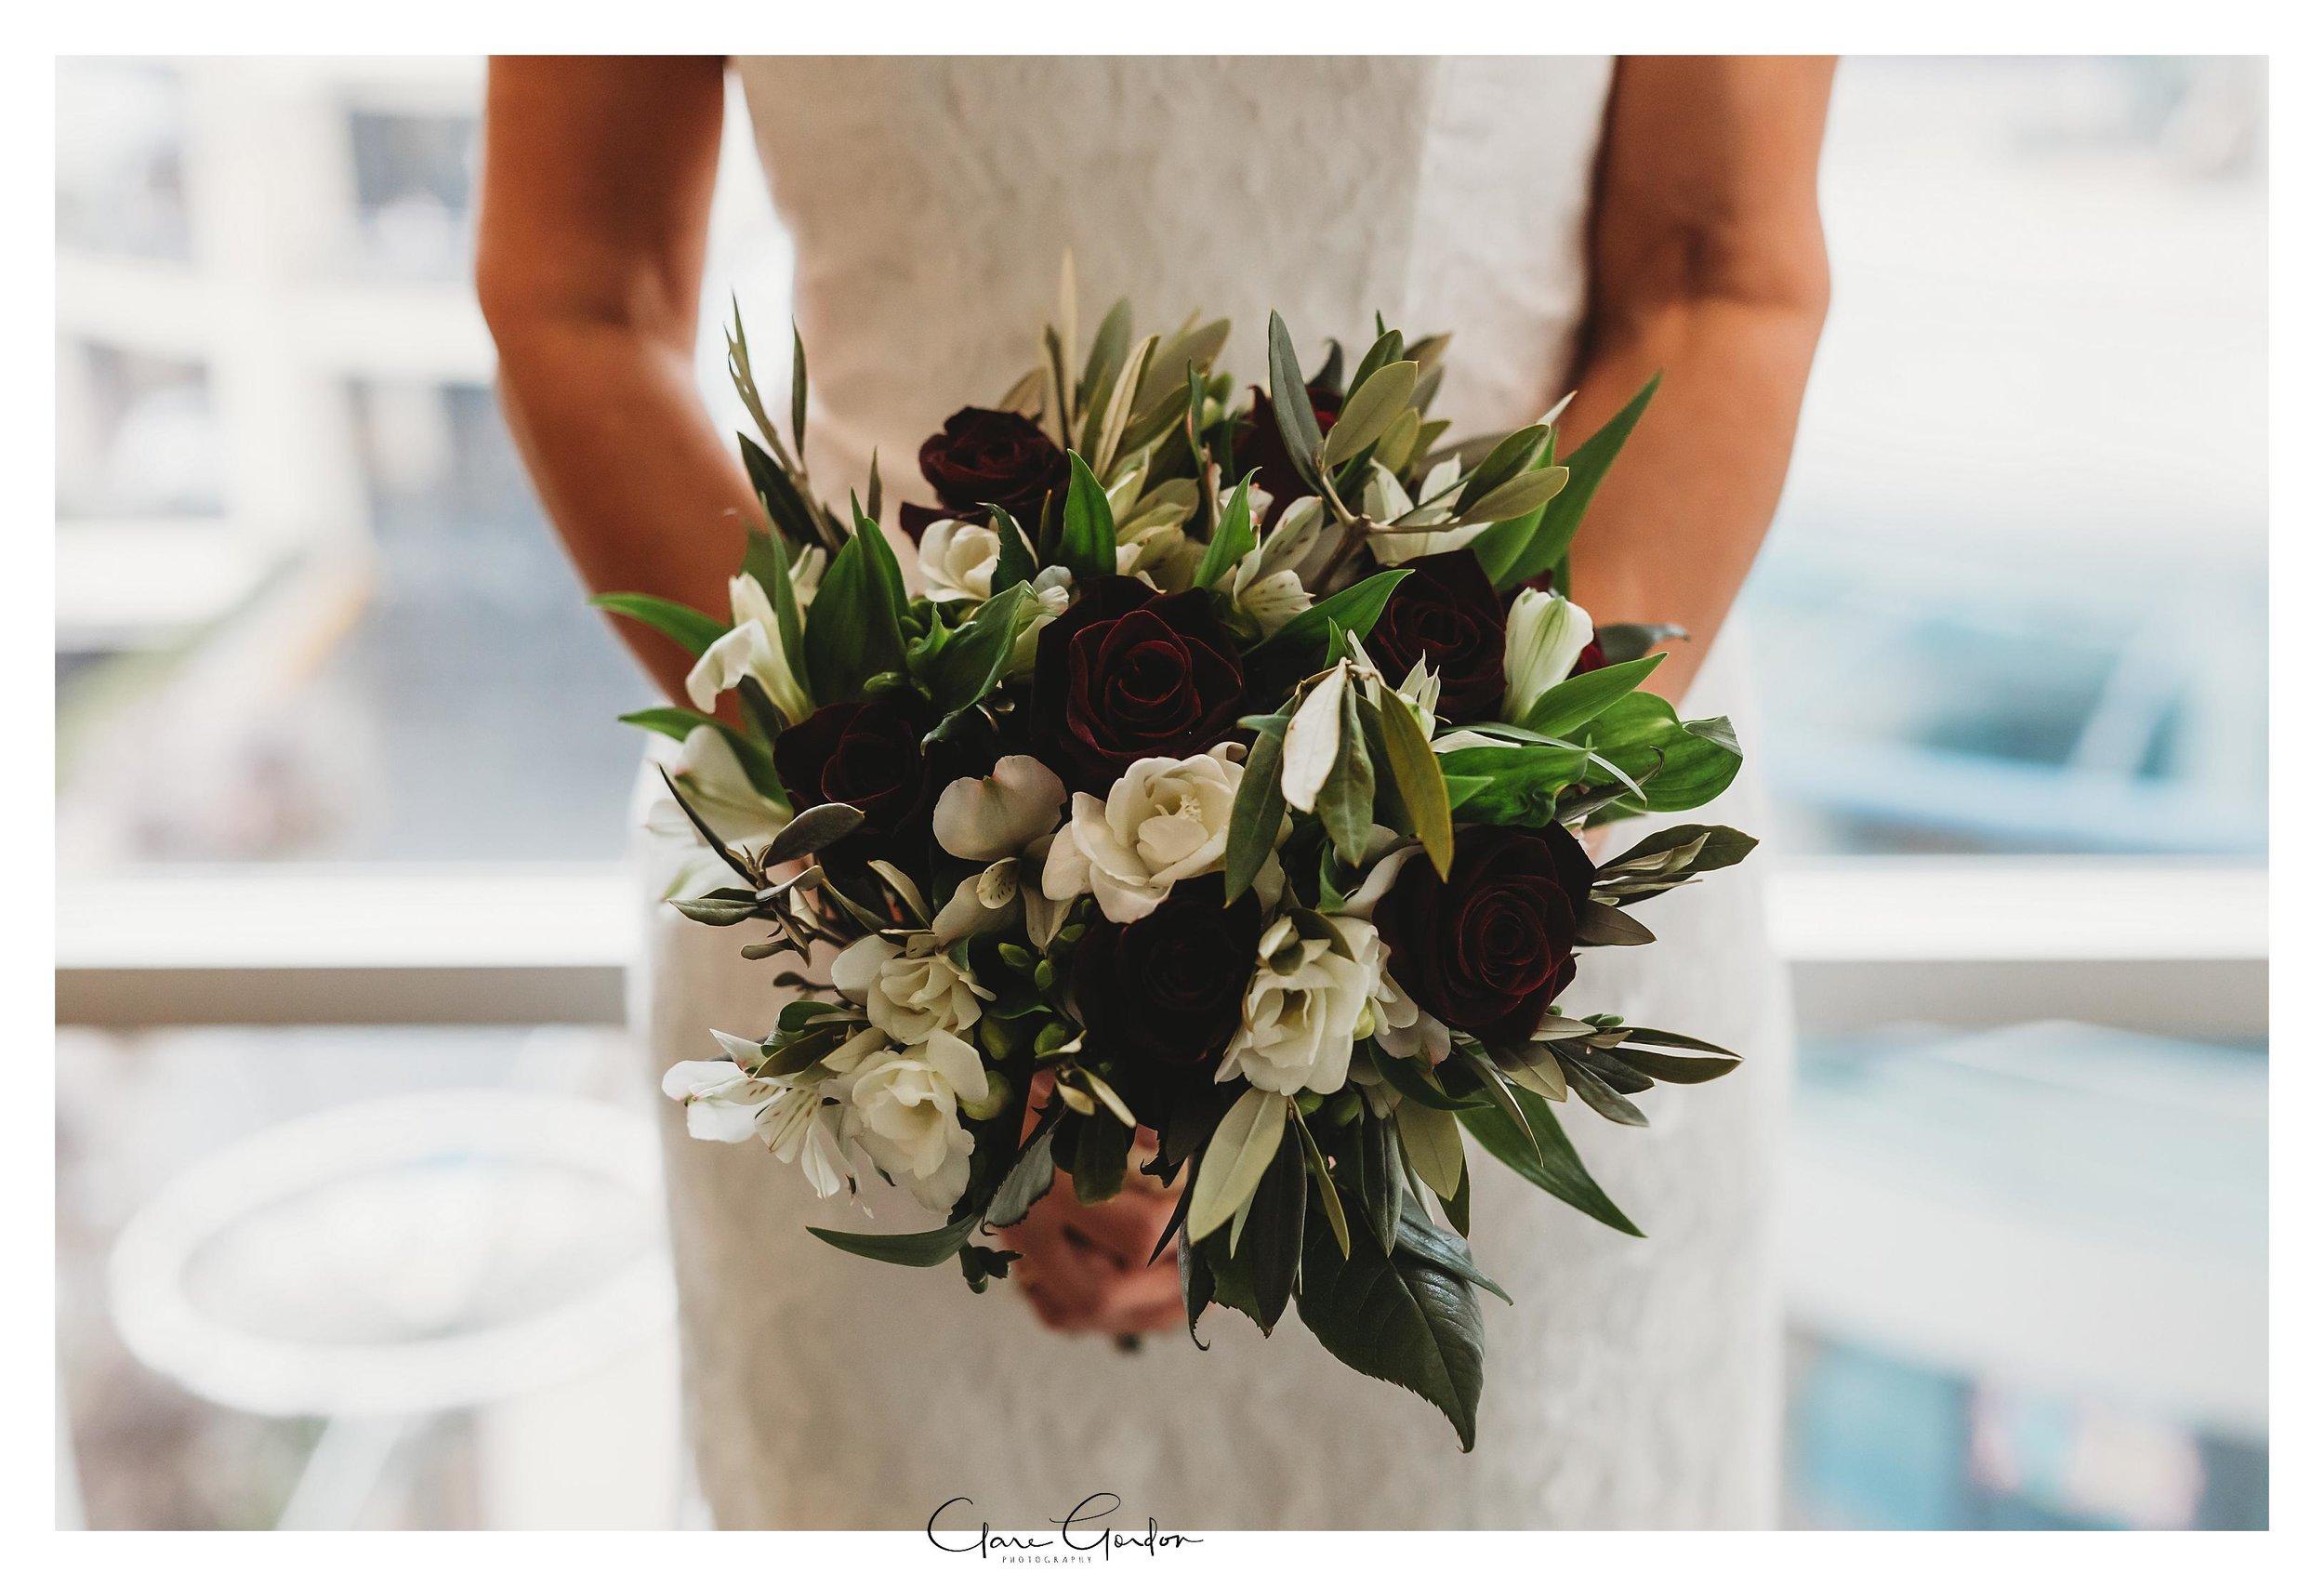 Hamilton-NZ-wedding-photographer-Bride-reflection-Waikato-wedding-photographer-Novotel-Hamilton-Clare-Gordon-photography (8).jpg